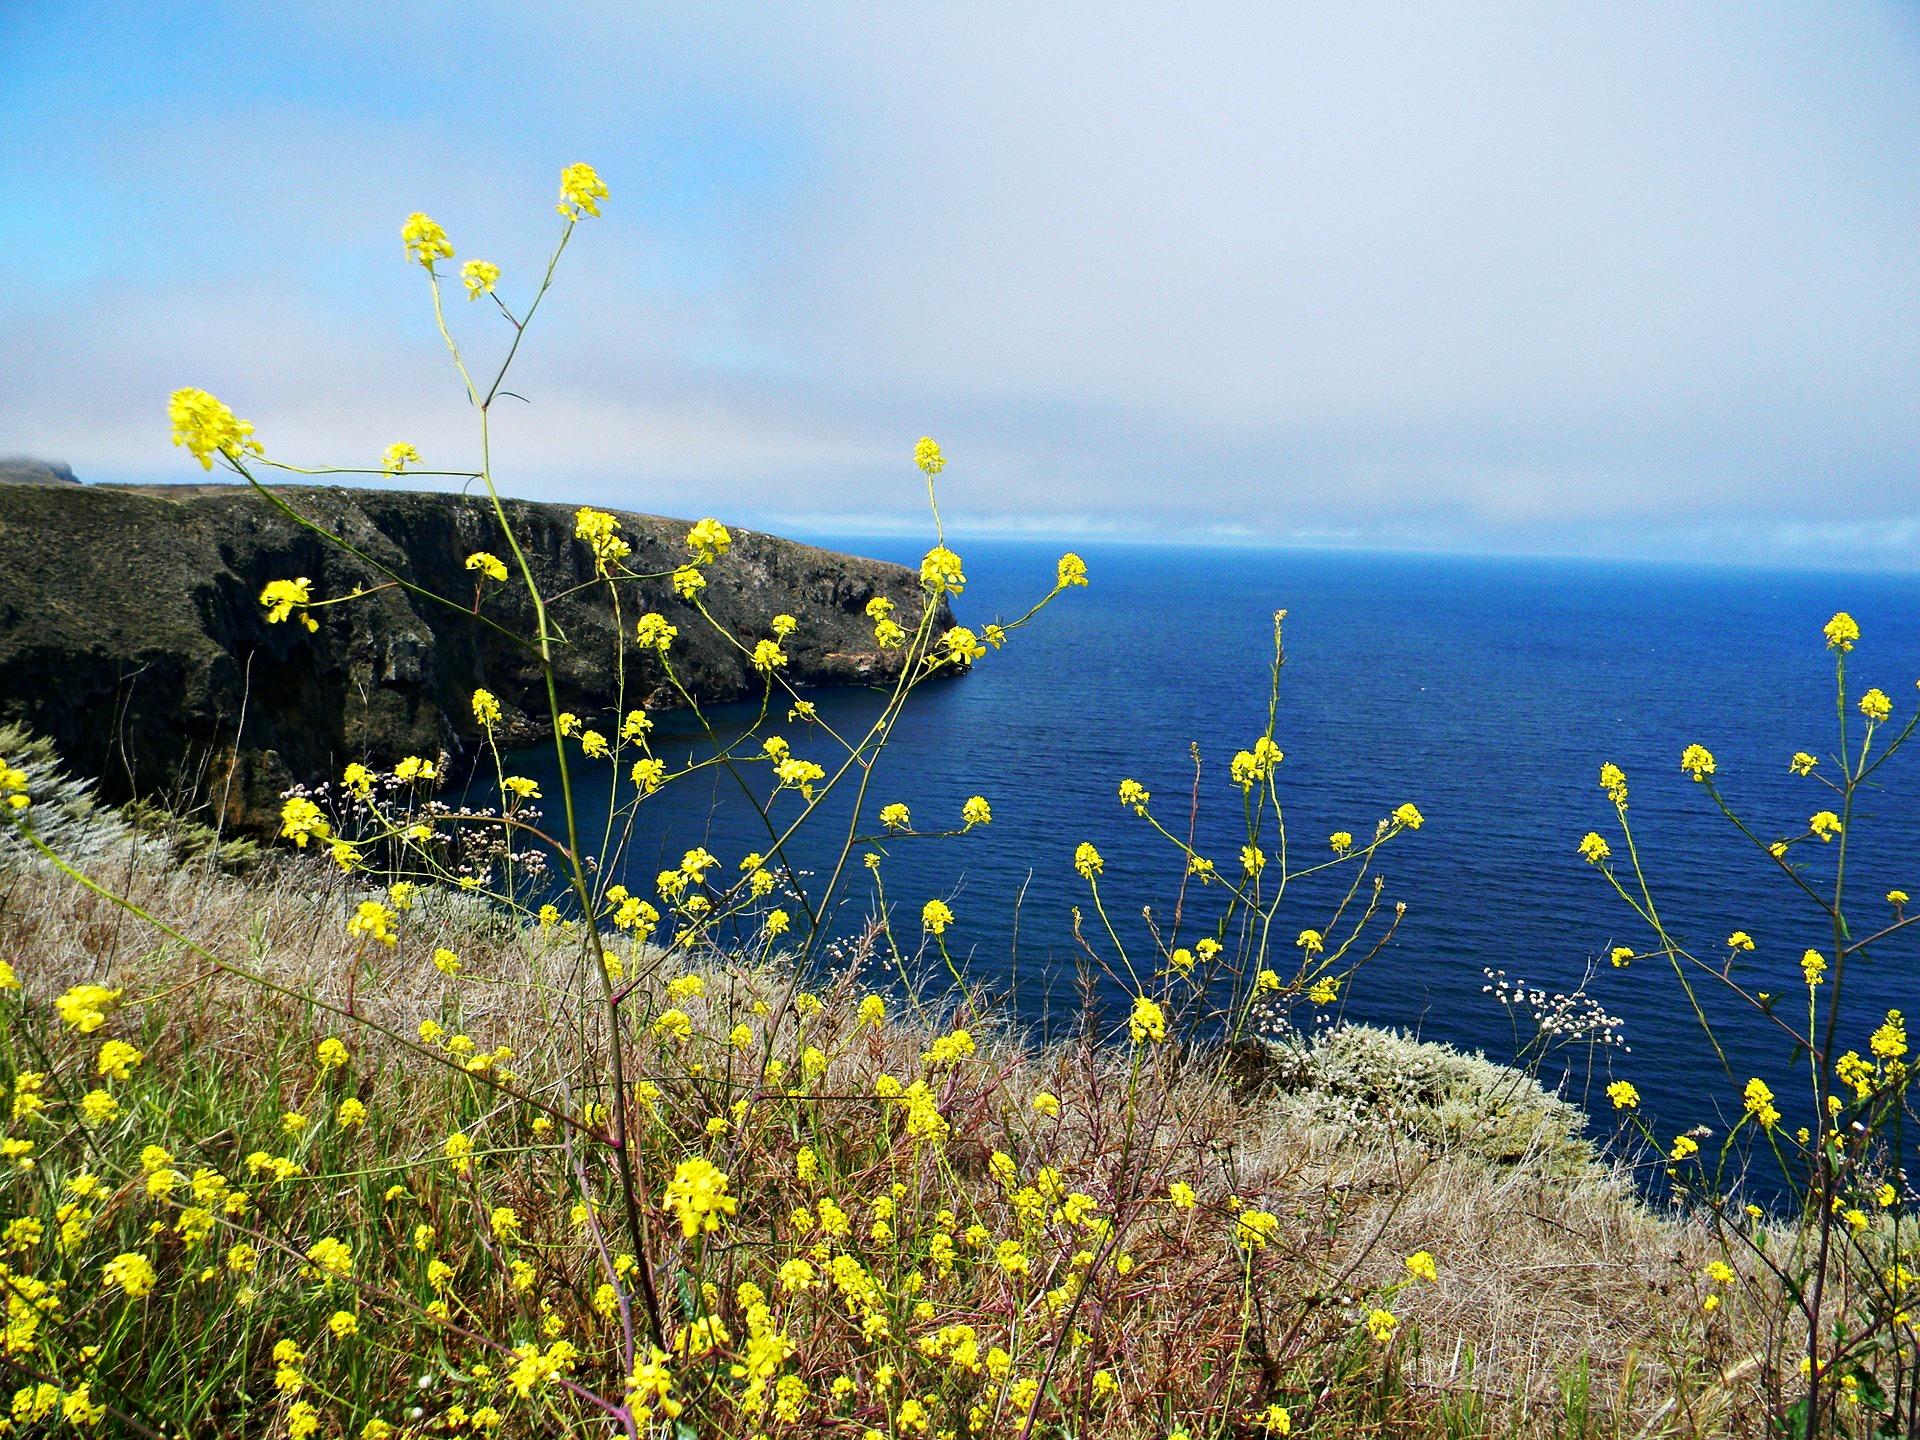 channel-islands-national-park-santa-cruz-cliff